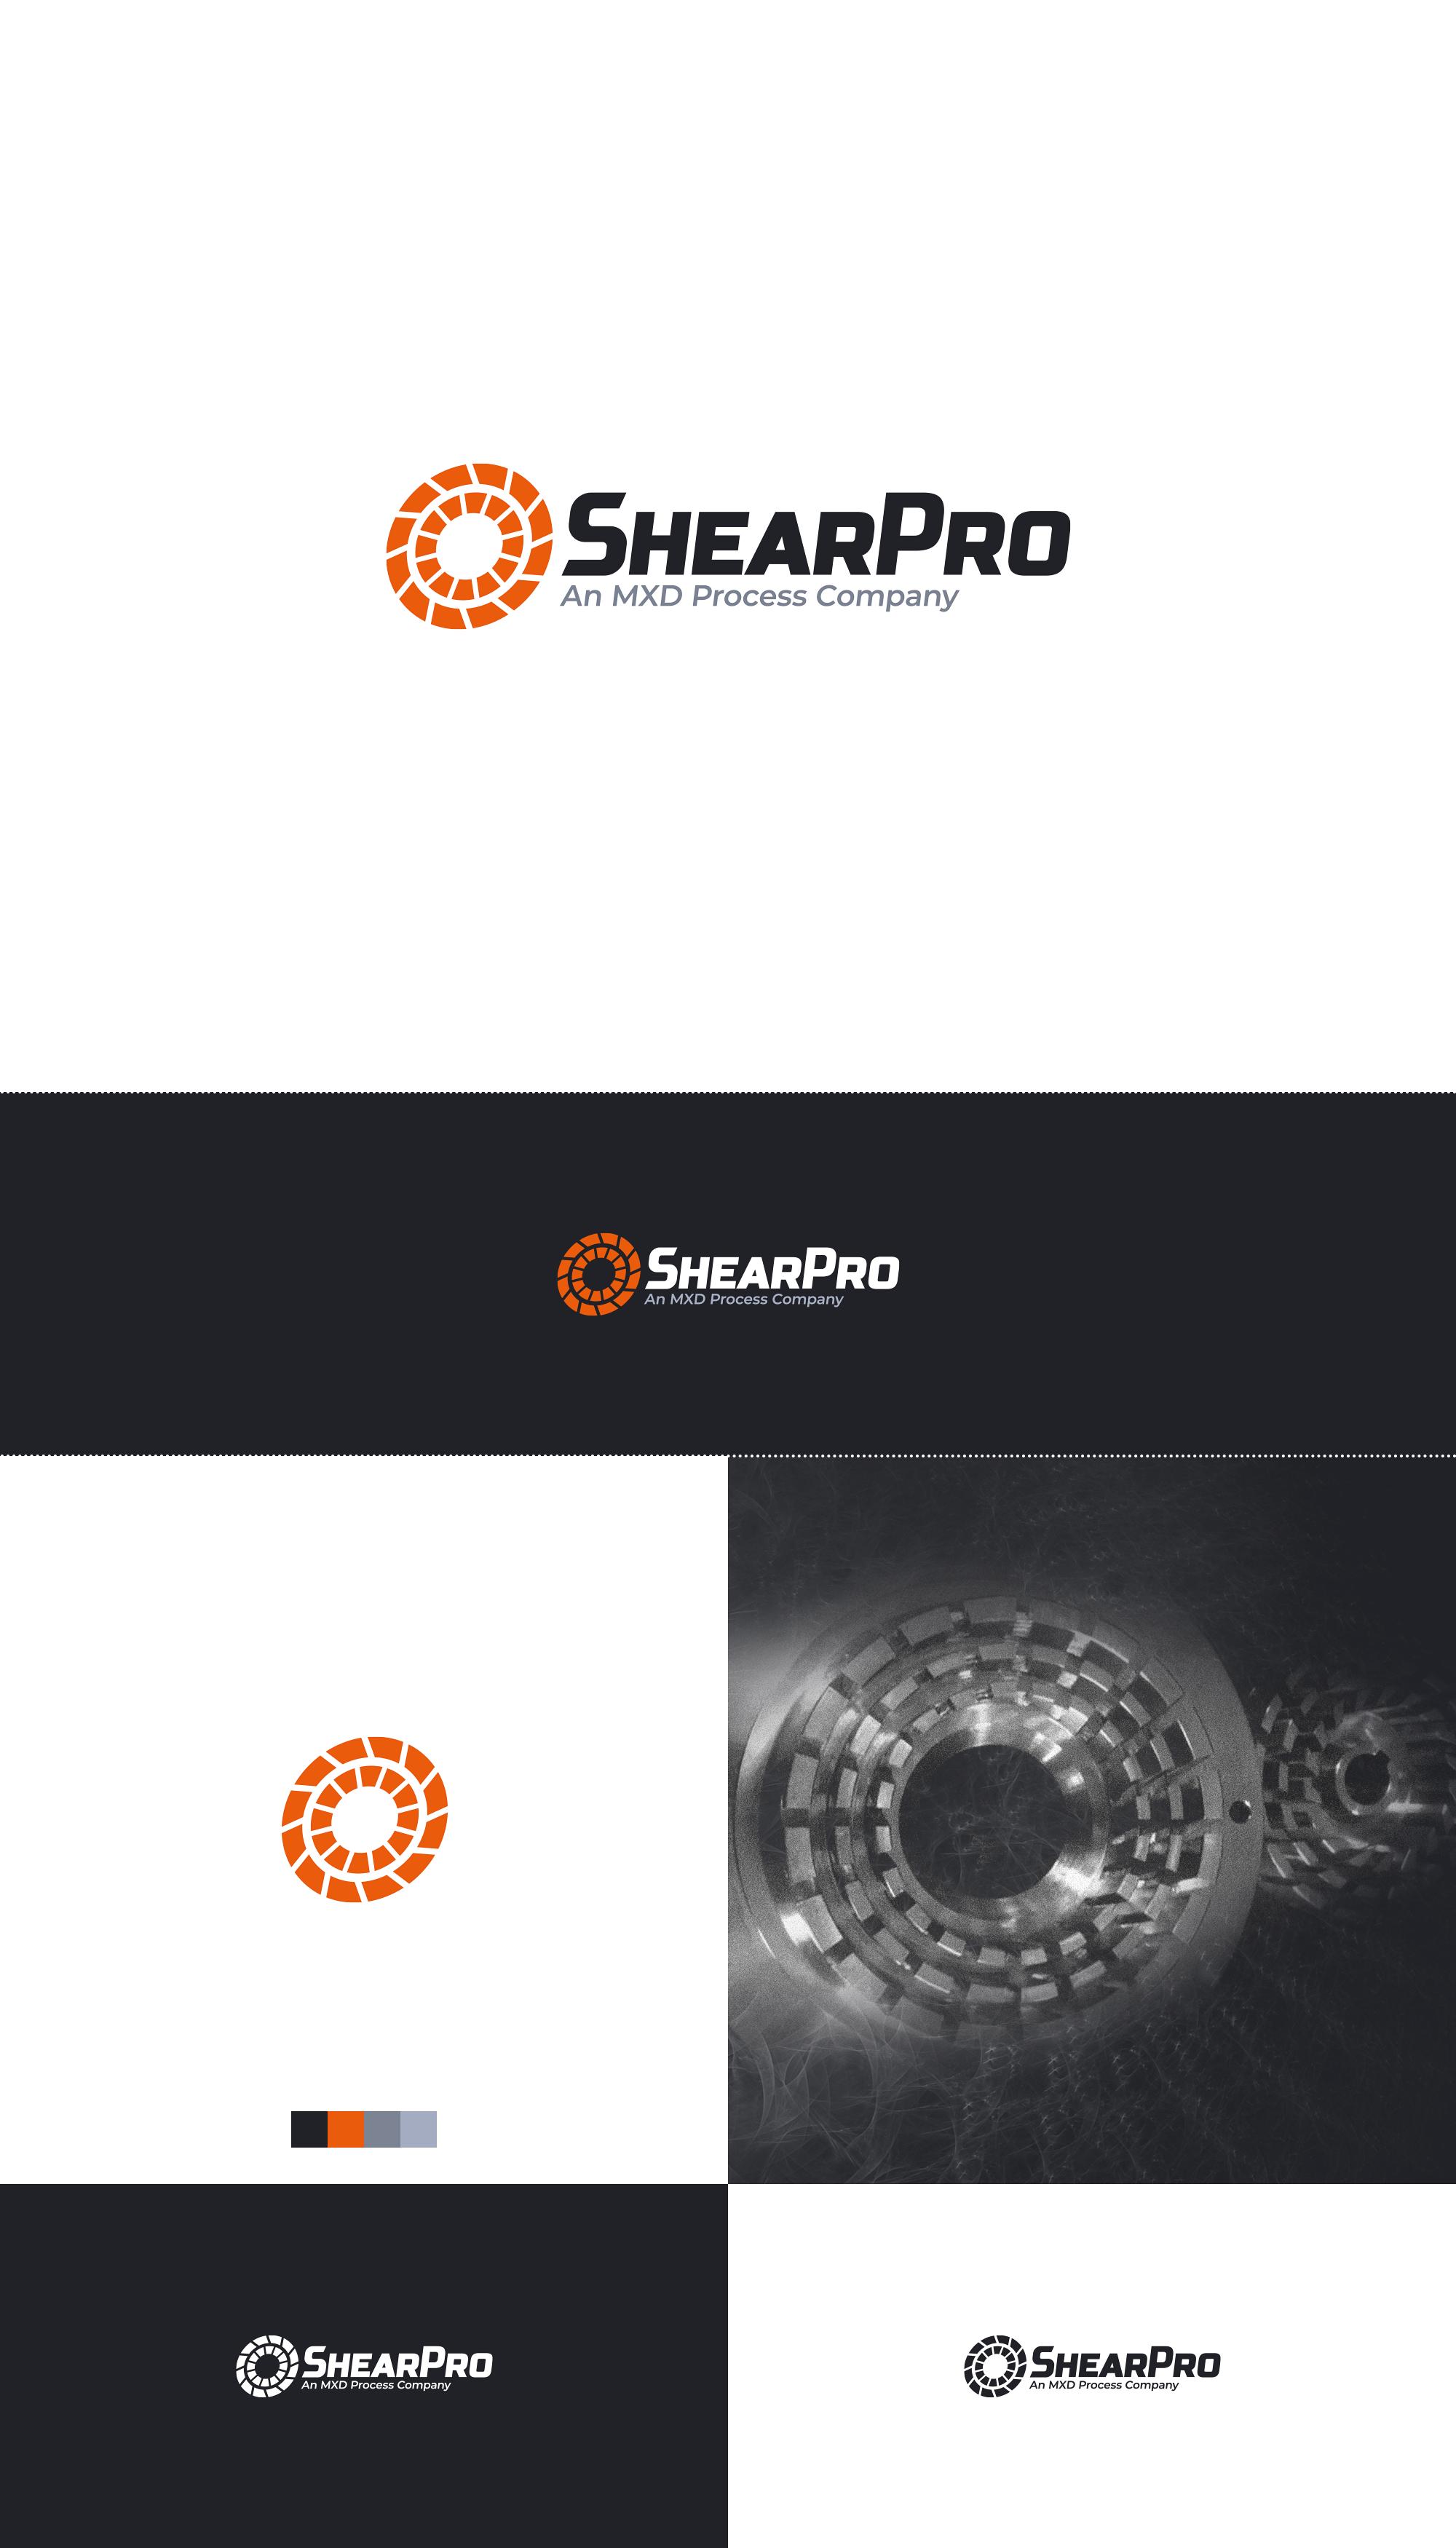 LOGO - Shearpro - Company logo and color scheme